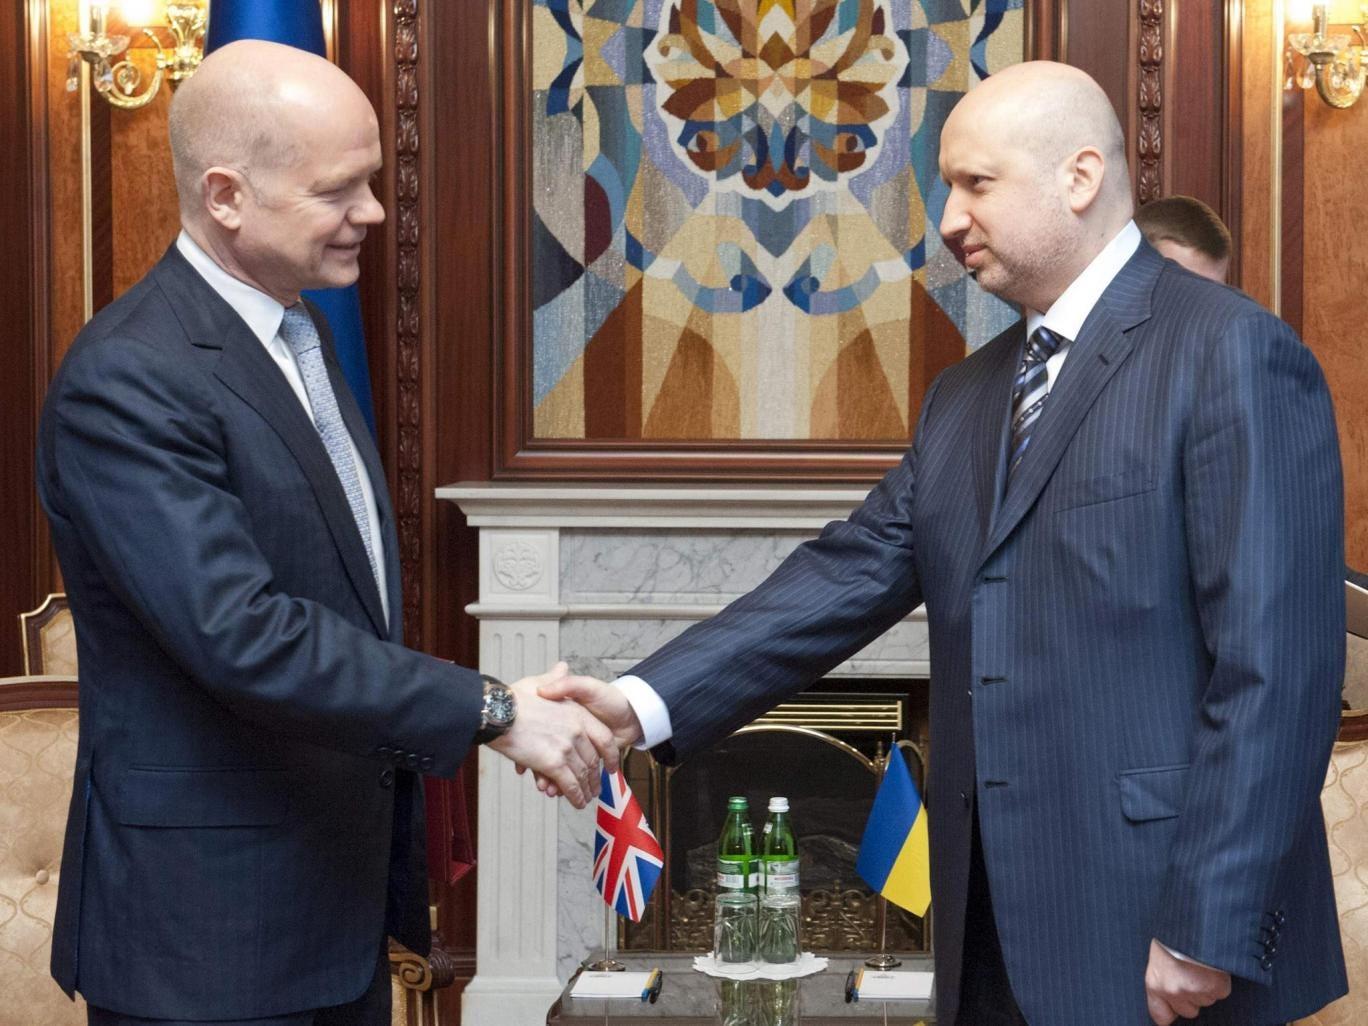 Ukraine's acting President Oleksander Turchinov meets with British Foreign Secretary William Hague in Kiev